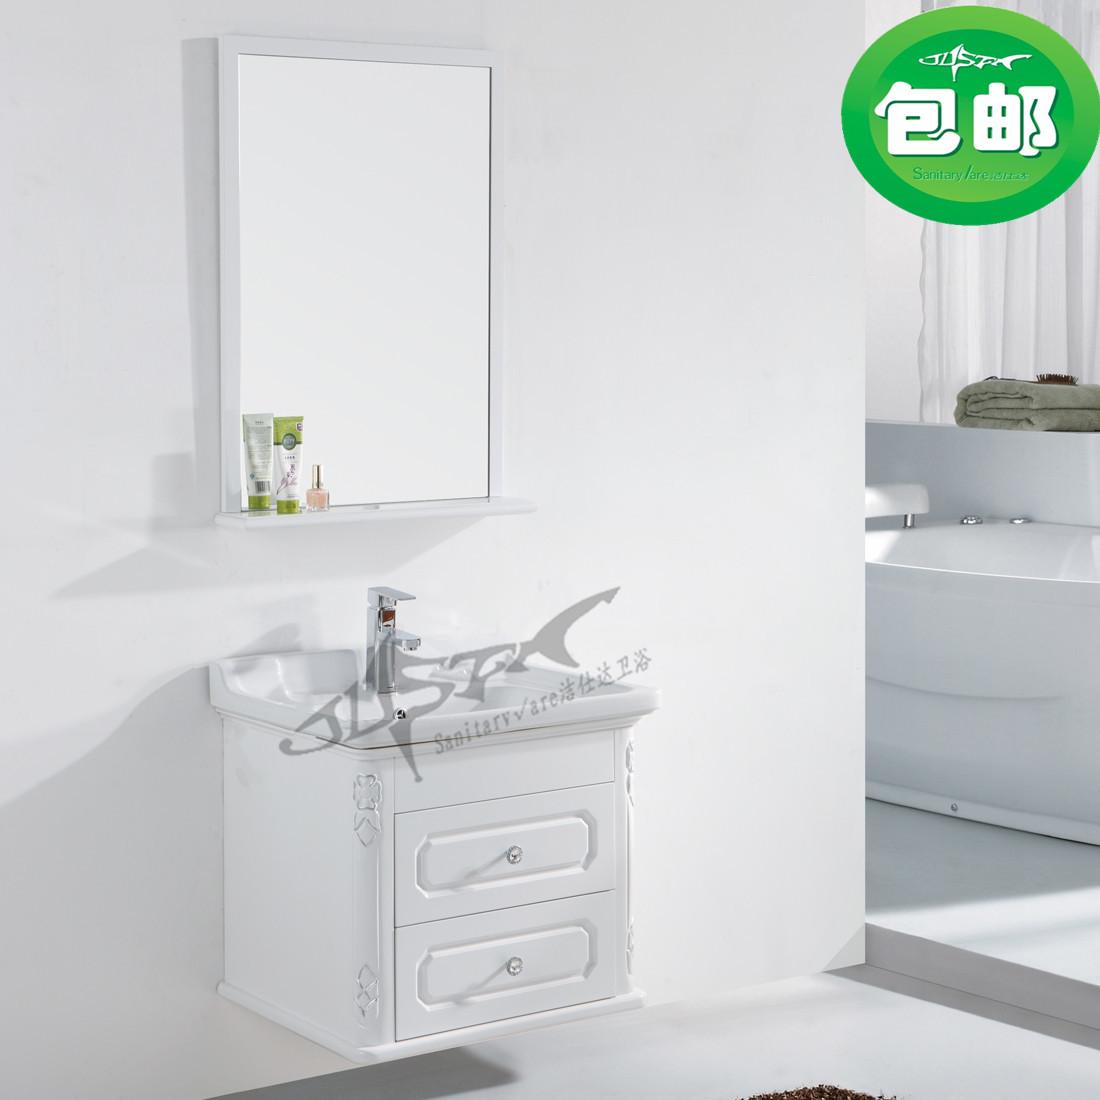 Online kopen wholesale eikenhouten wastafel kast uit china eikenhouten wastafel kast groothandel - Mode badkamer ...